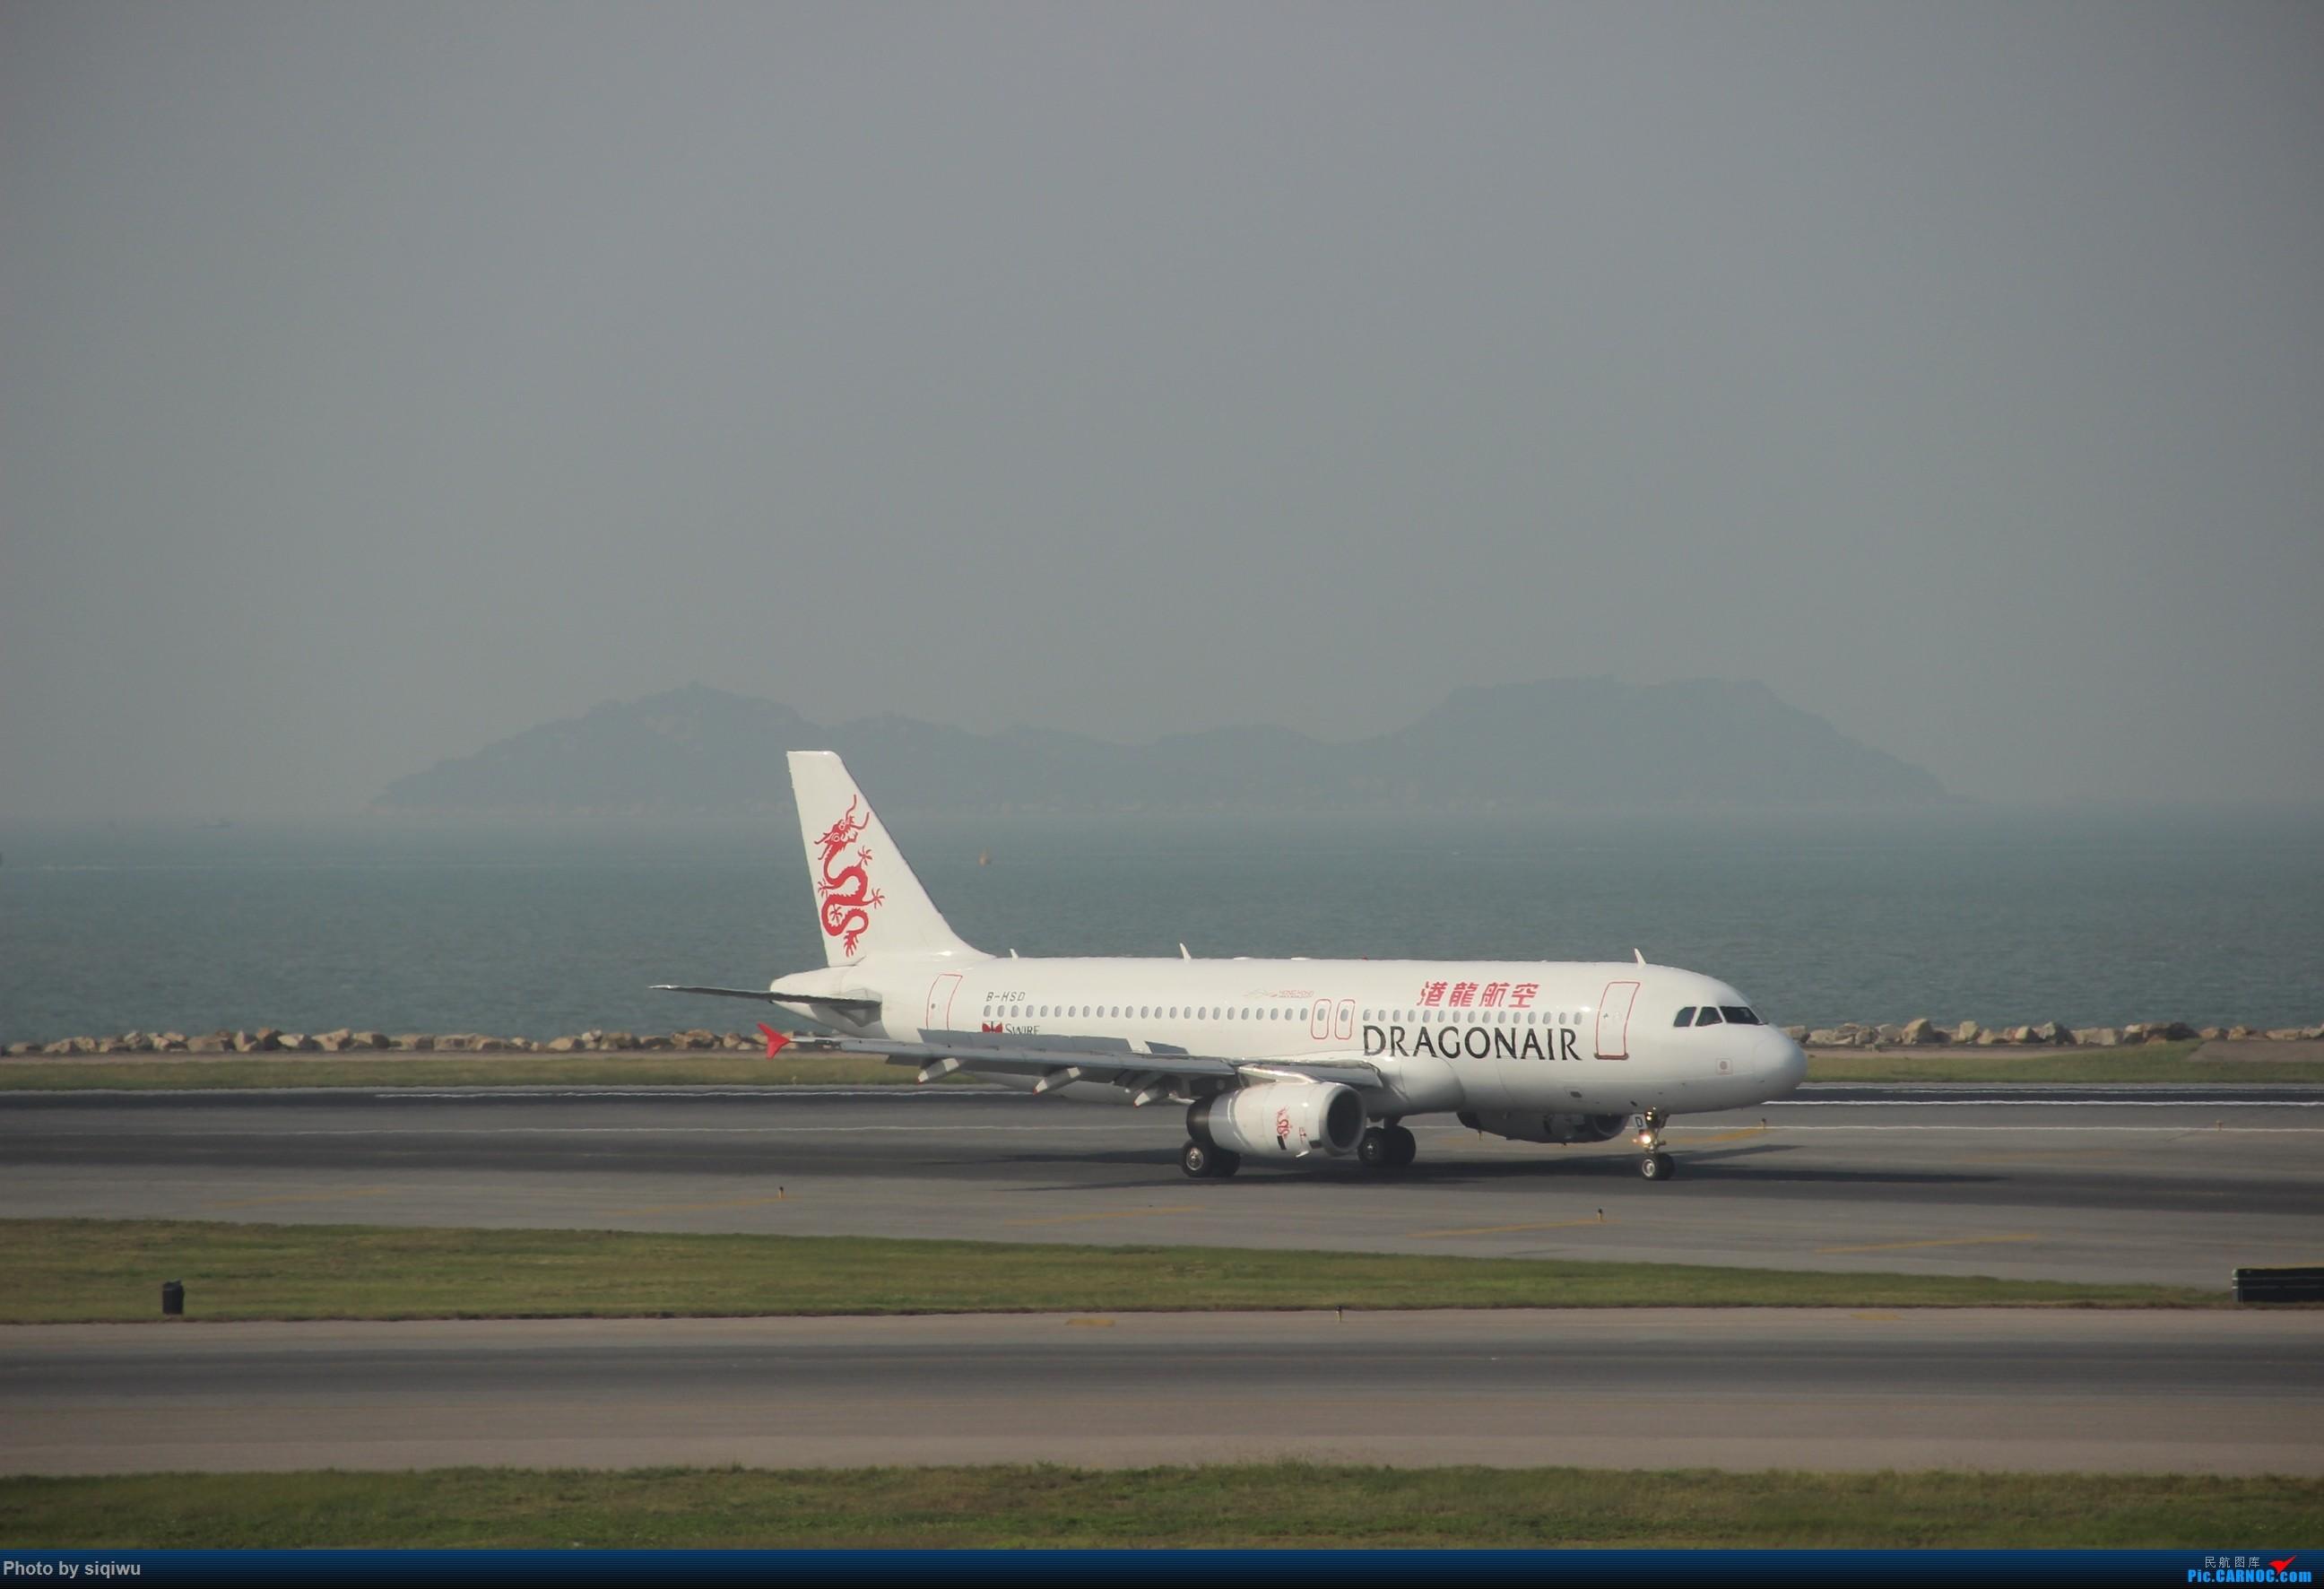 Re:[原创]PVG-HKG-KUL-HKG-PVG 四天往返,CX/KA AIRBUS A320-200  中国香港国际机场